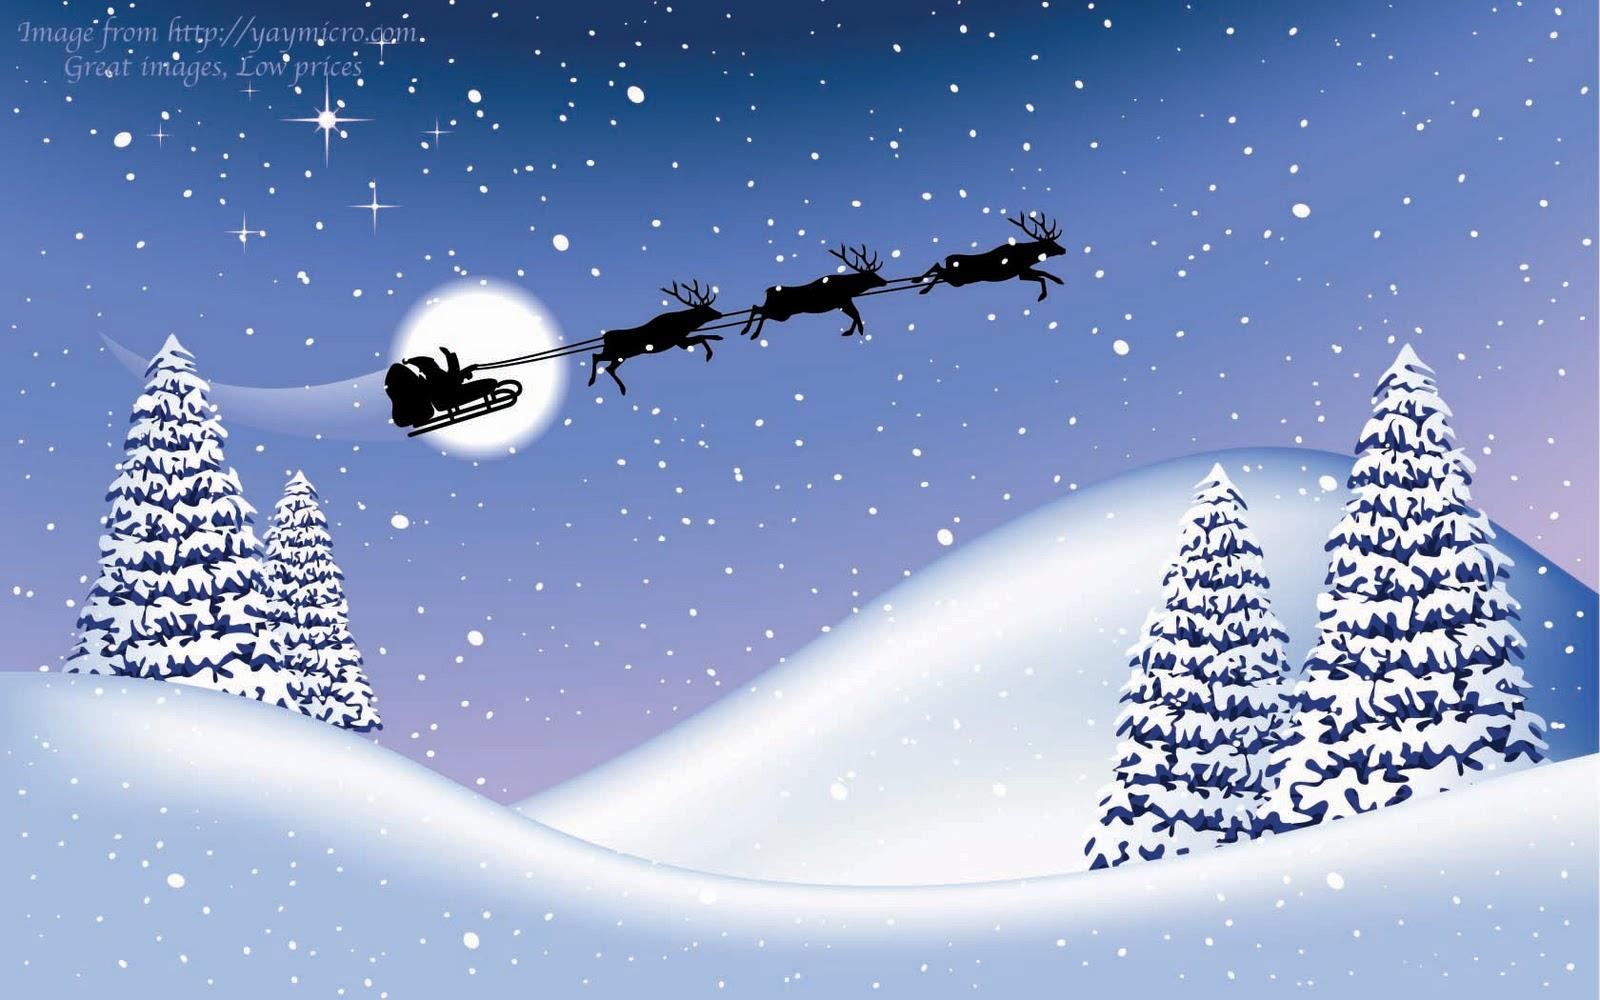 14 christmas wallpapers free santa claus and reendiers flying wallpaper